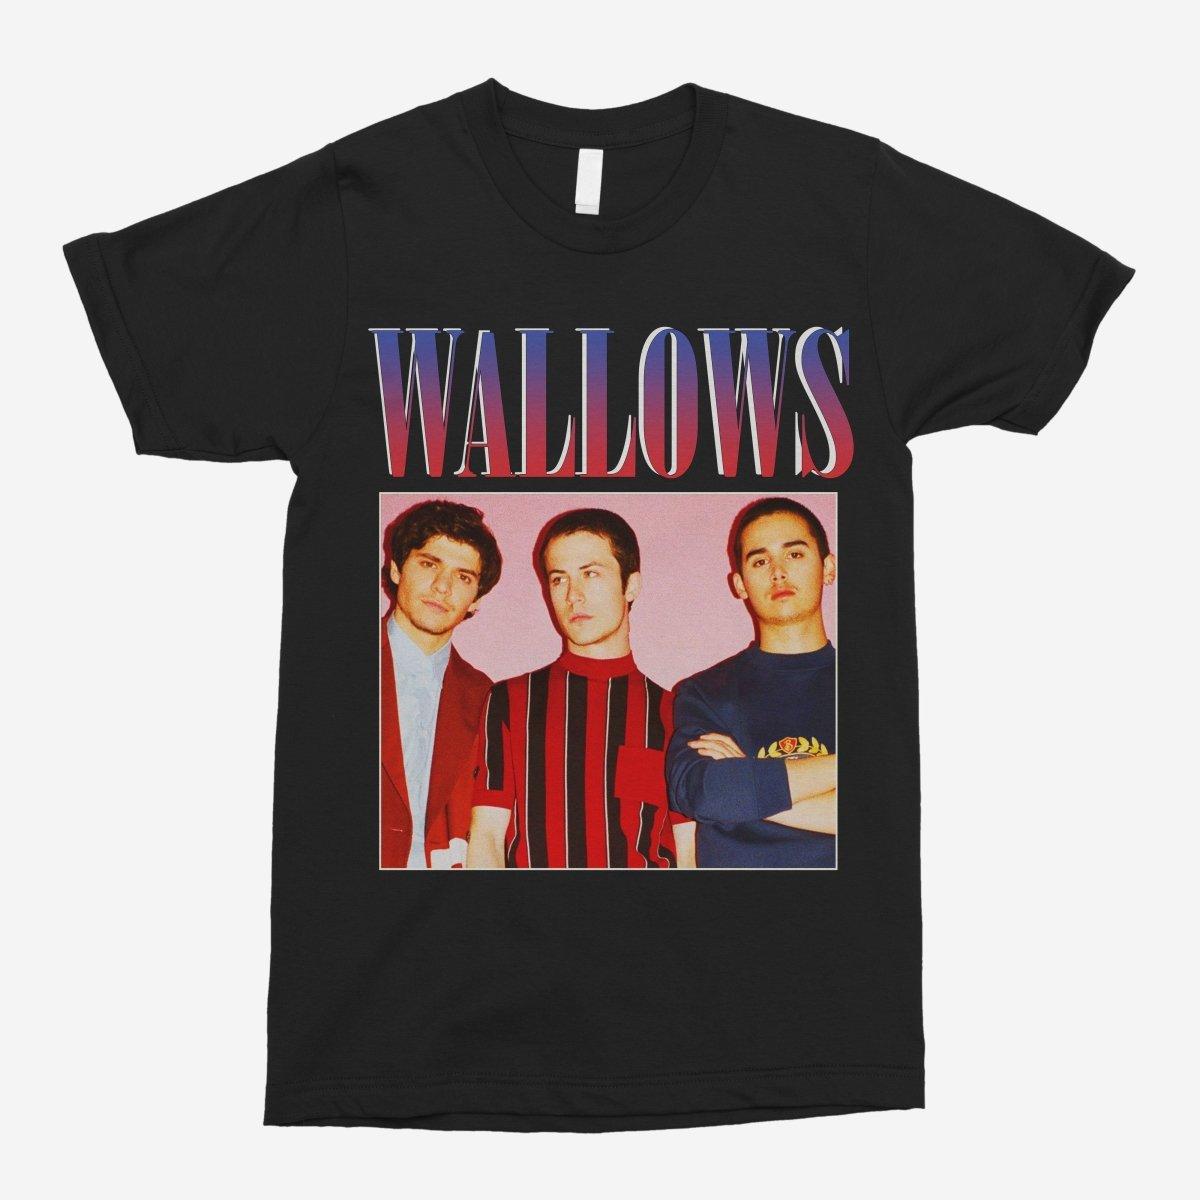 Wallows Vintage Unisex T-Shirt